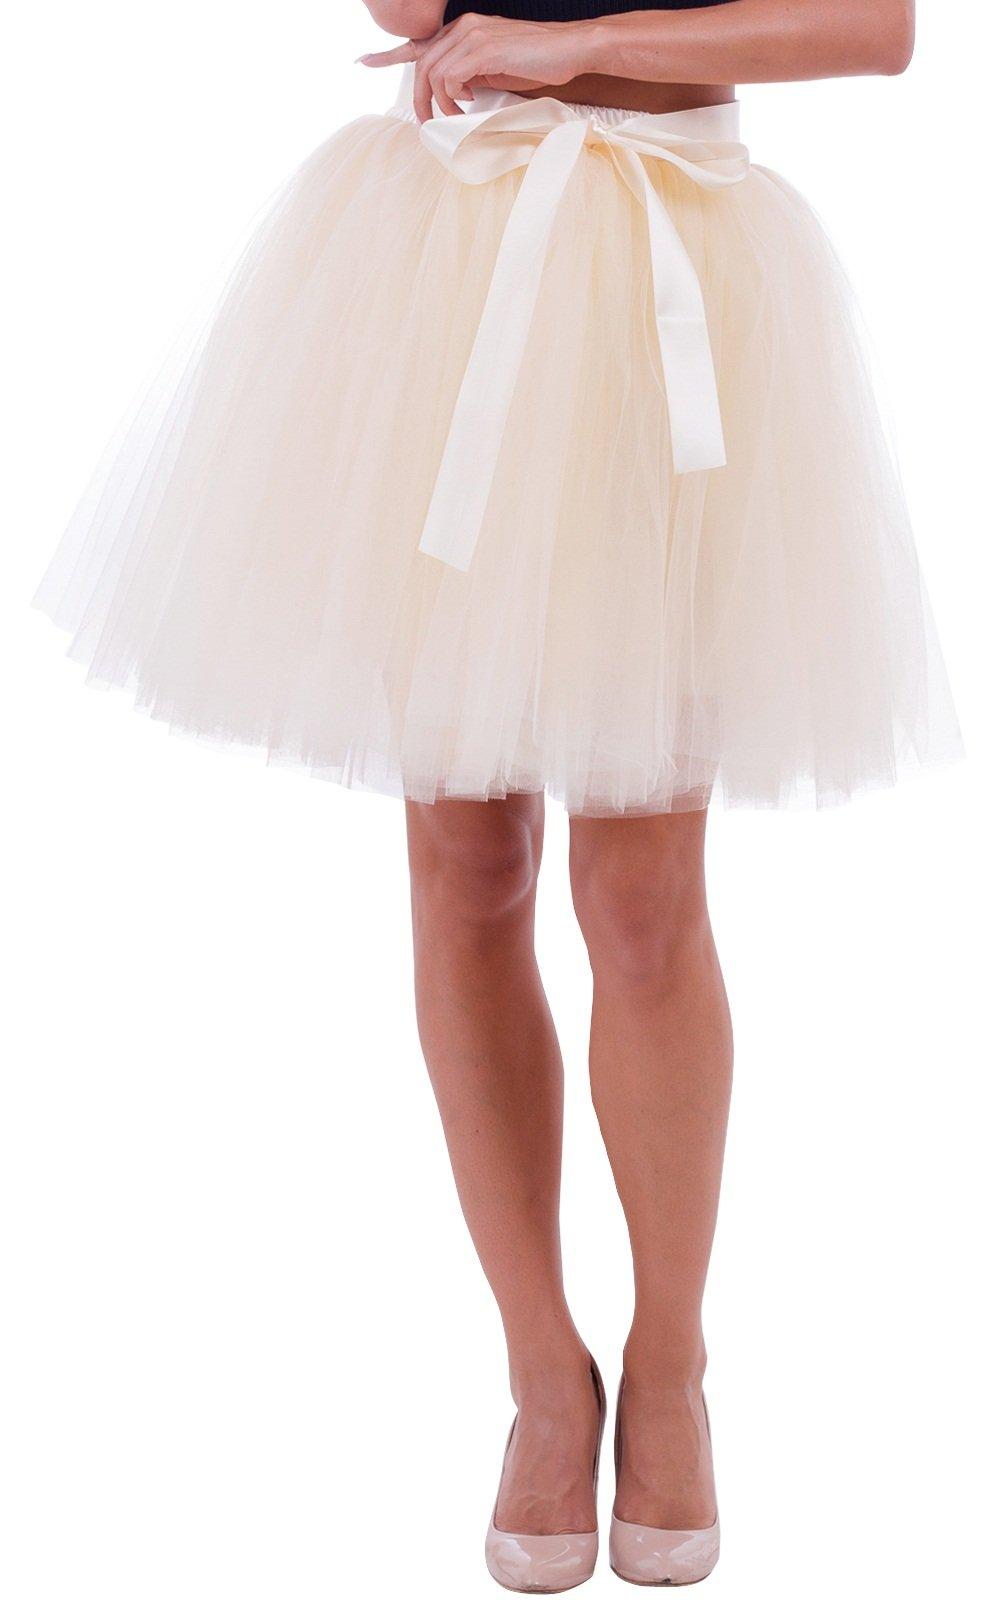 Duraplast Women's Above Knee Skirt Tutu Petticoat High Waist Tulle Beige